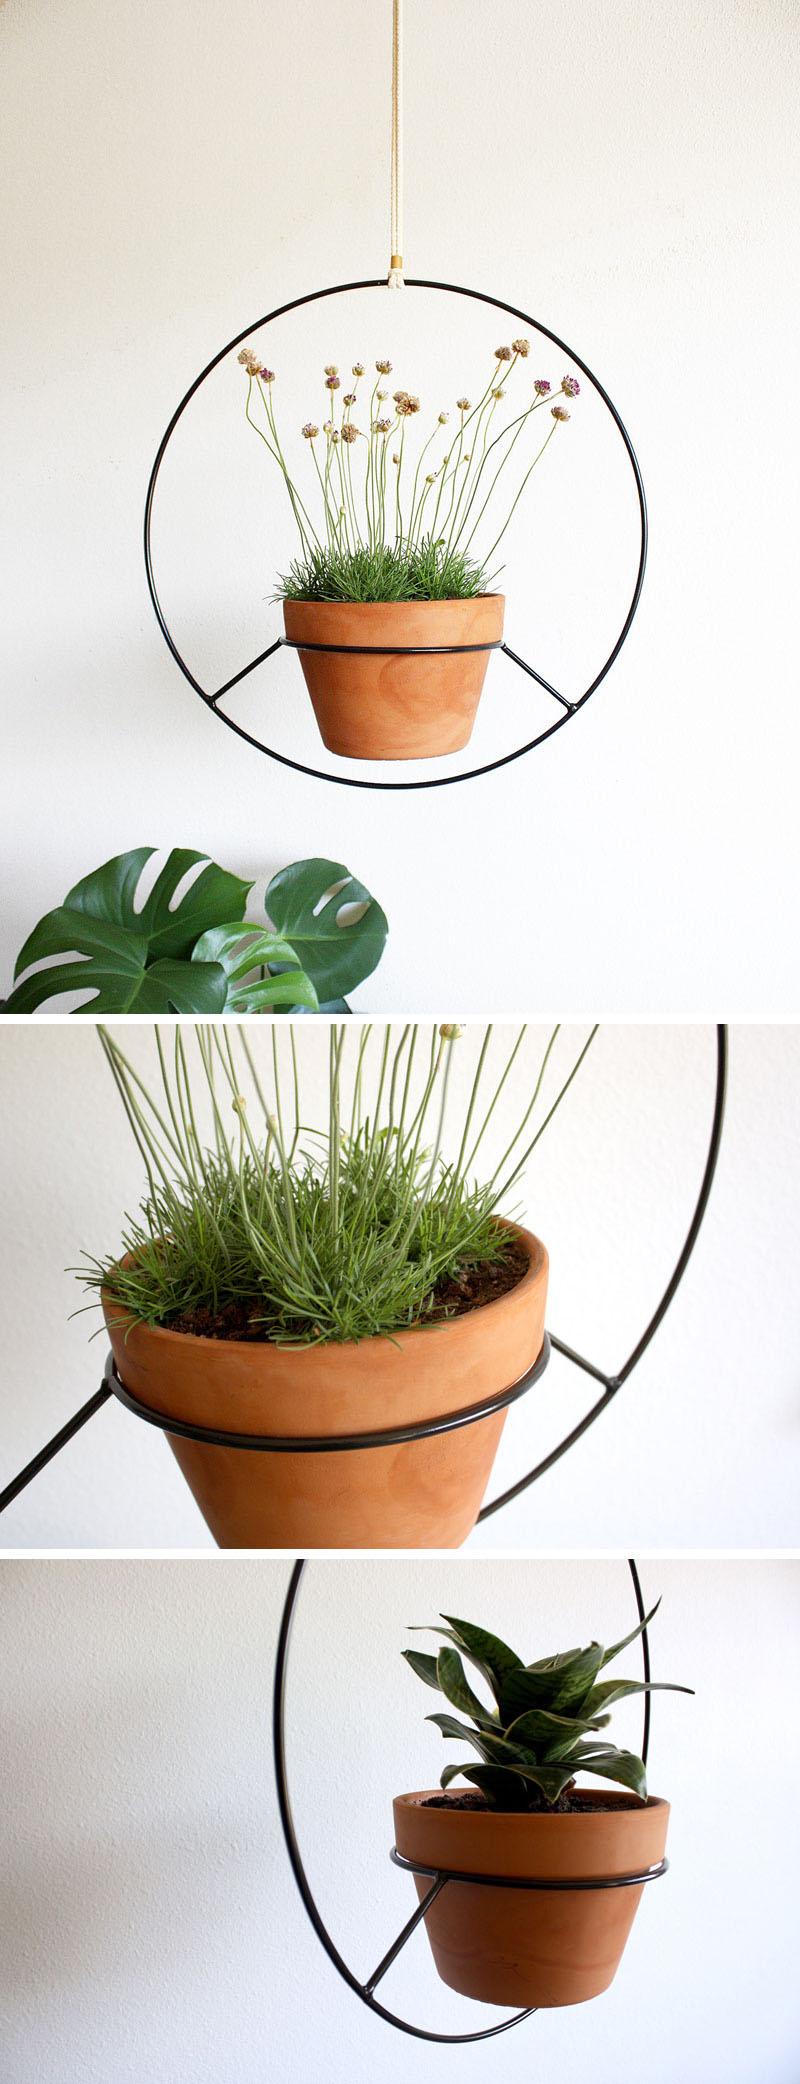 53 Indoor Garden Idea - Hang Your Plants From The Ceiling ... on Hanging Plant Pots Indoor  id=28093